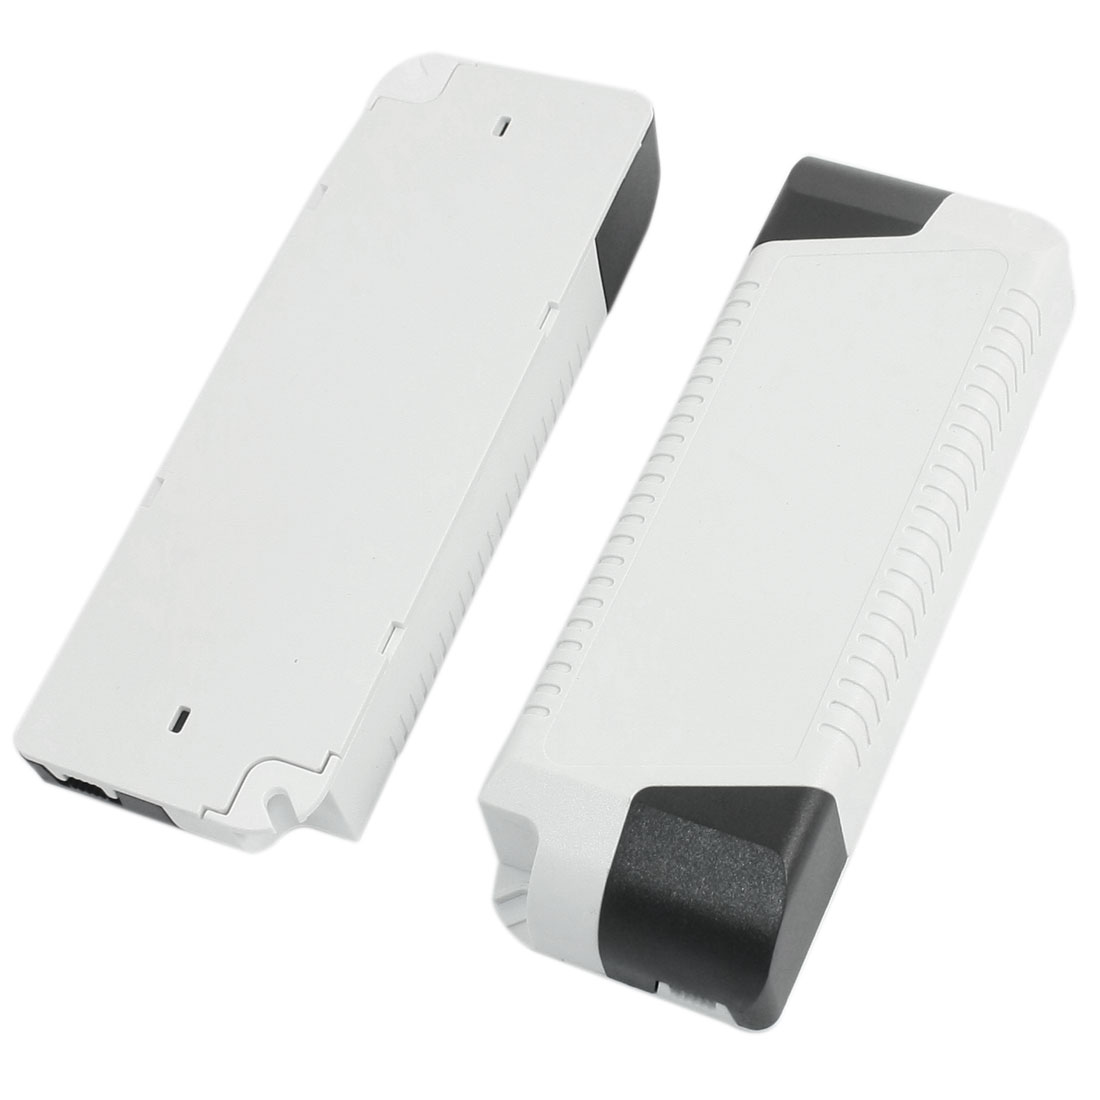 2pcs Black White 132x45x24mm LED Driver Power Supply Junction Boxes